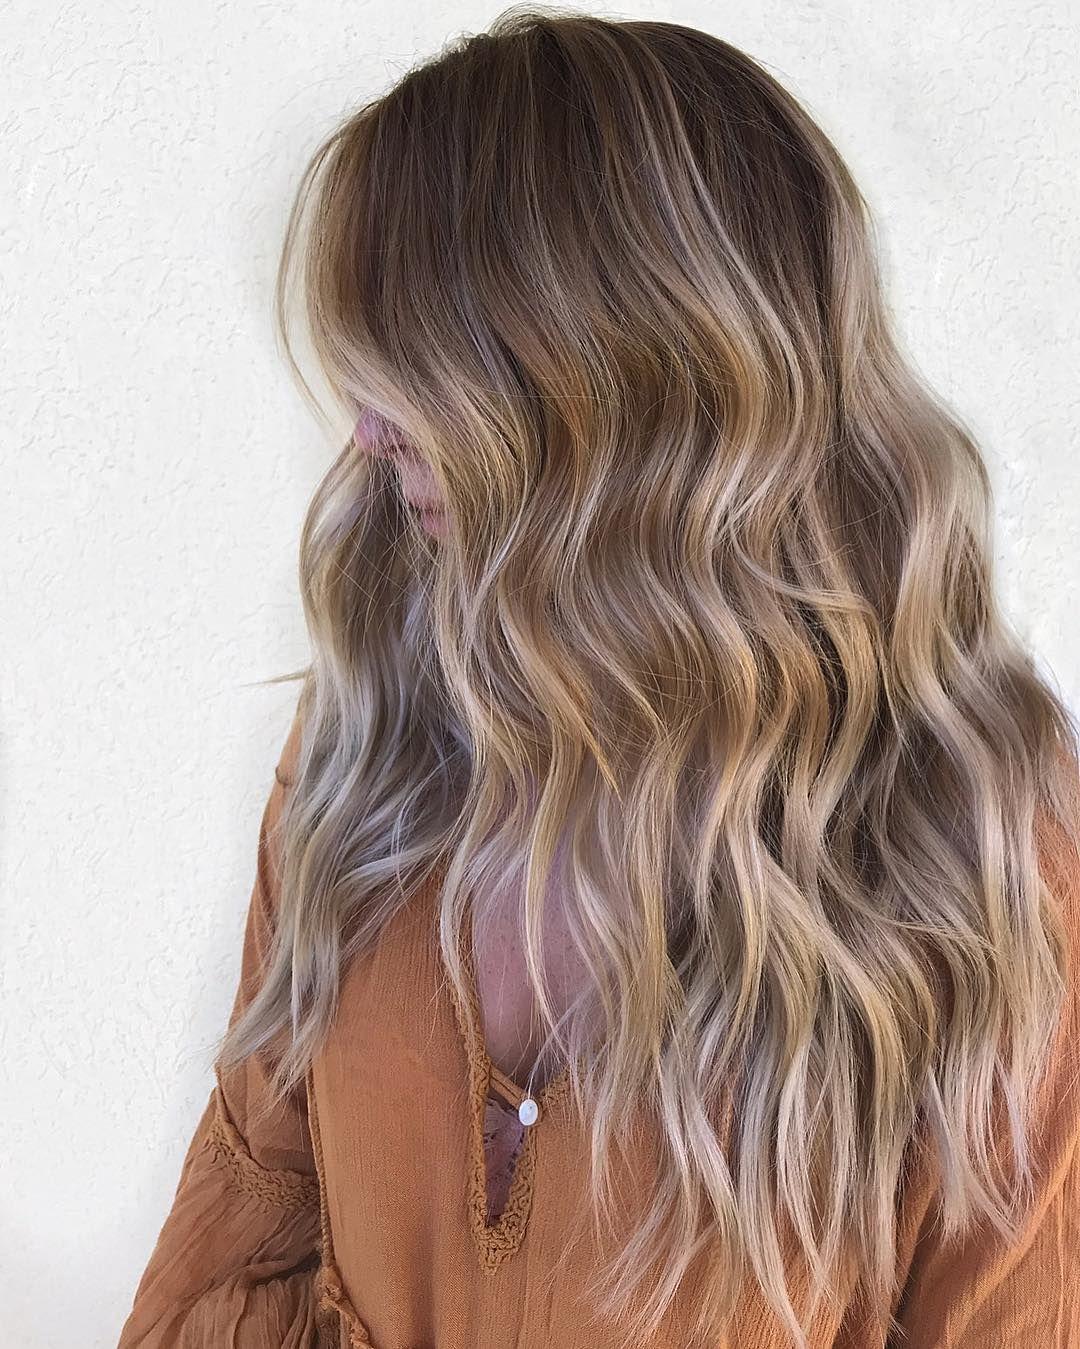 Hair Inspiration 2019-04-15 00:12:04